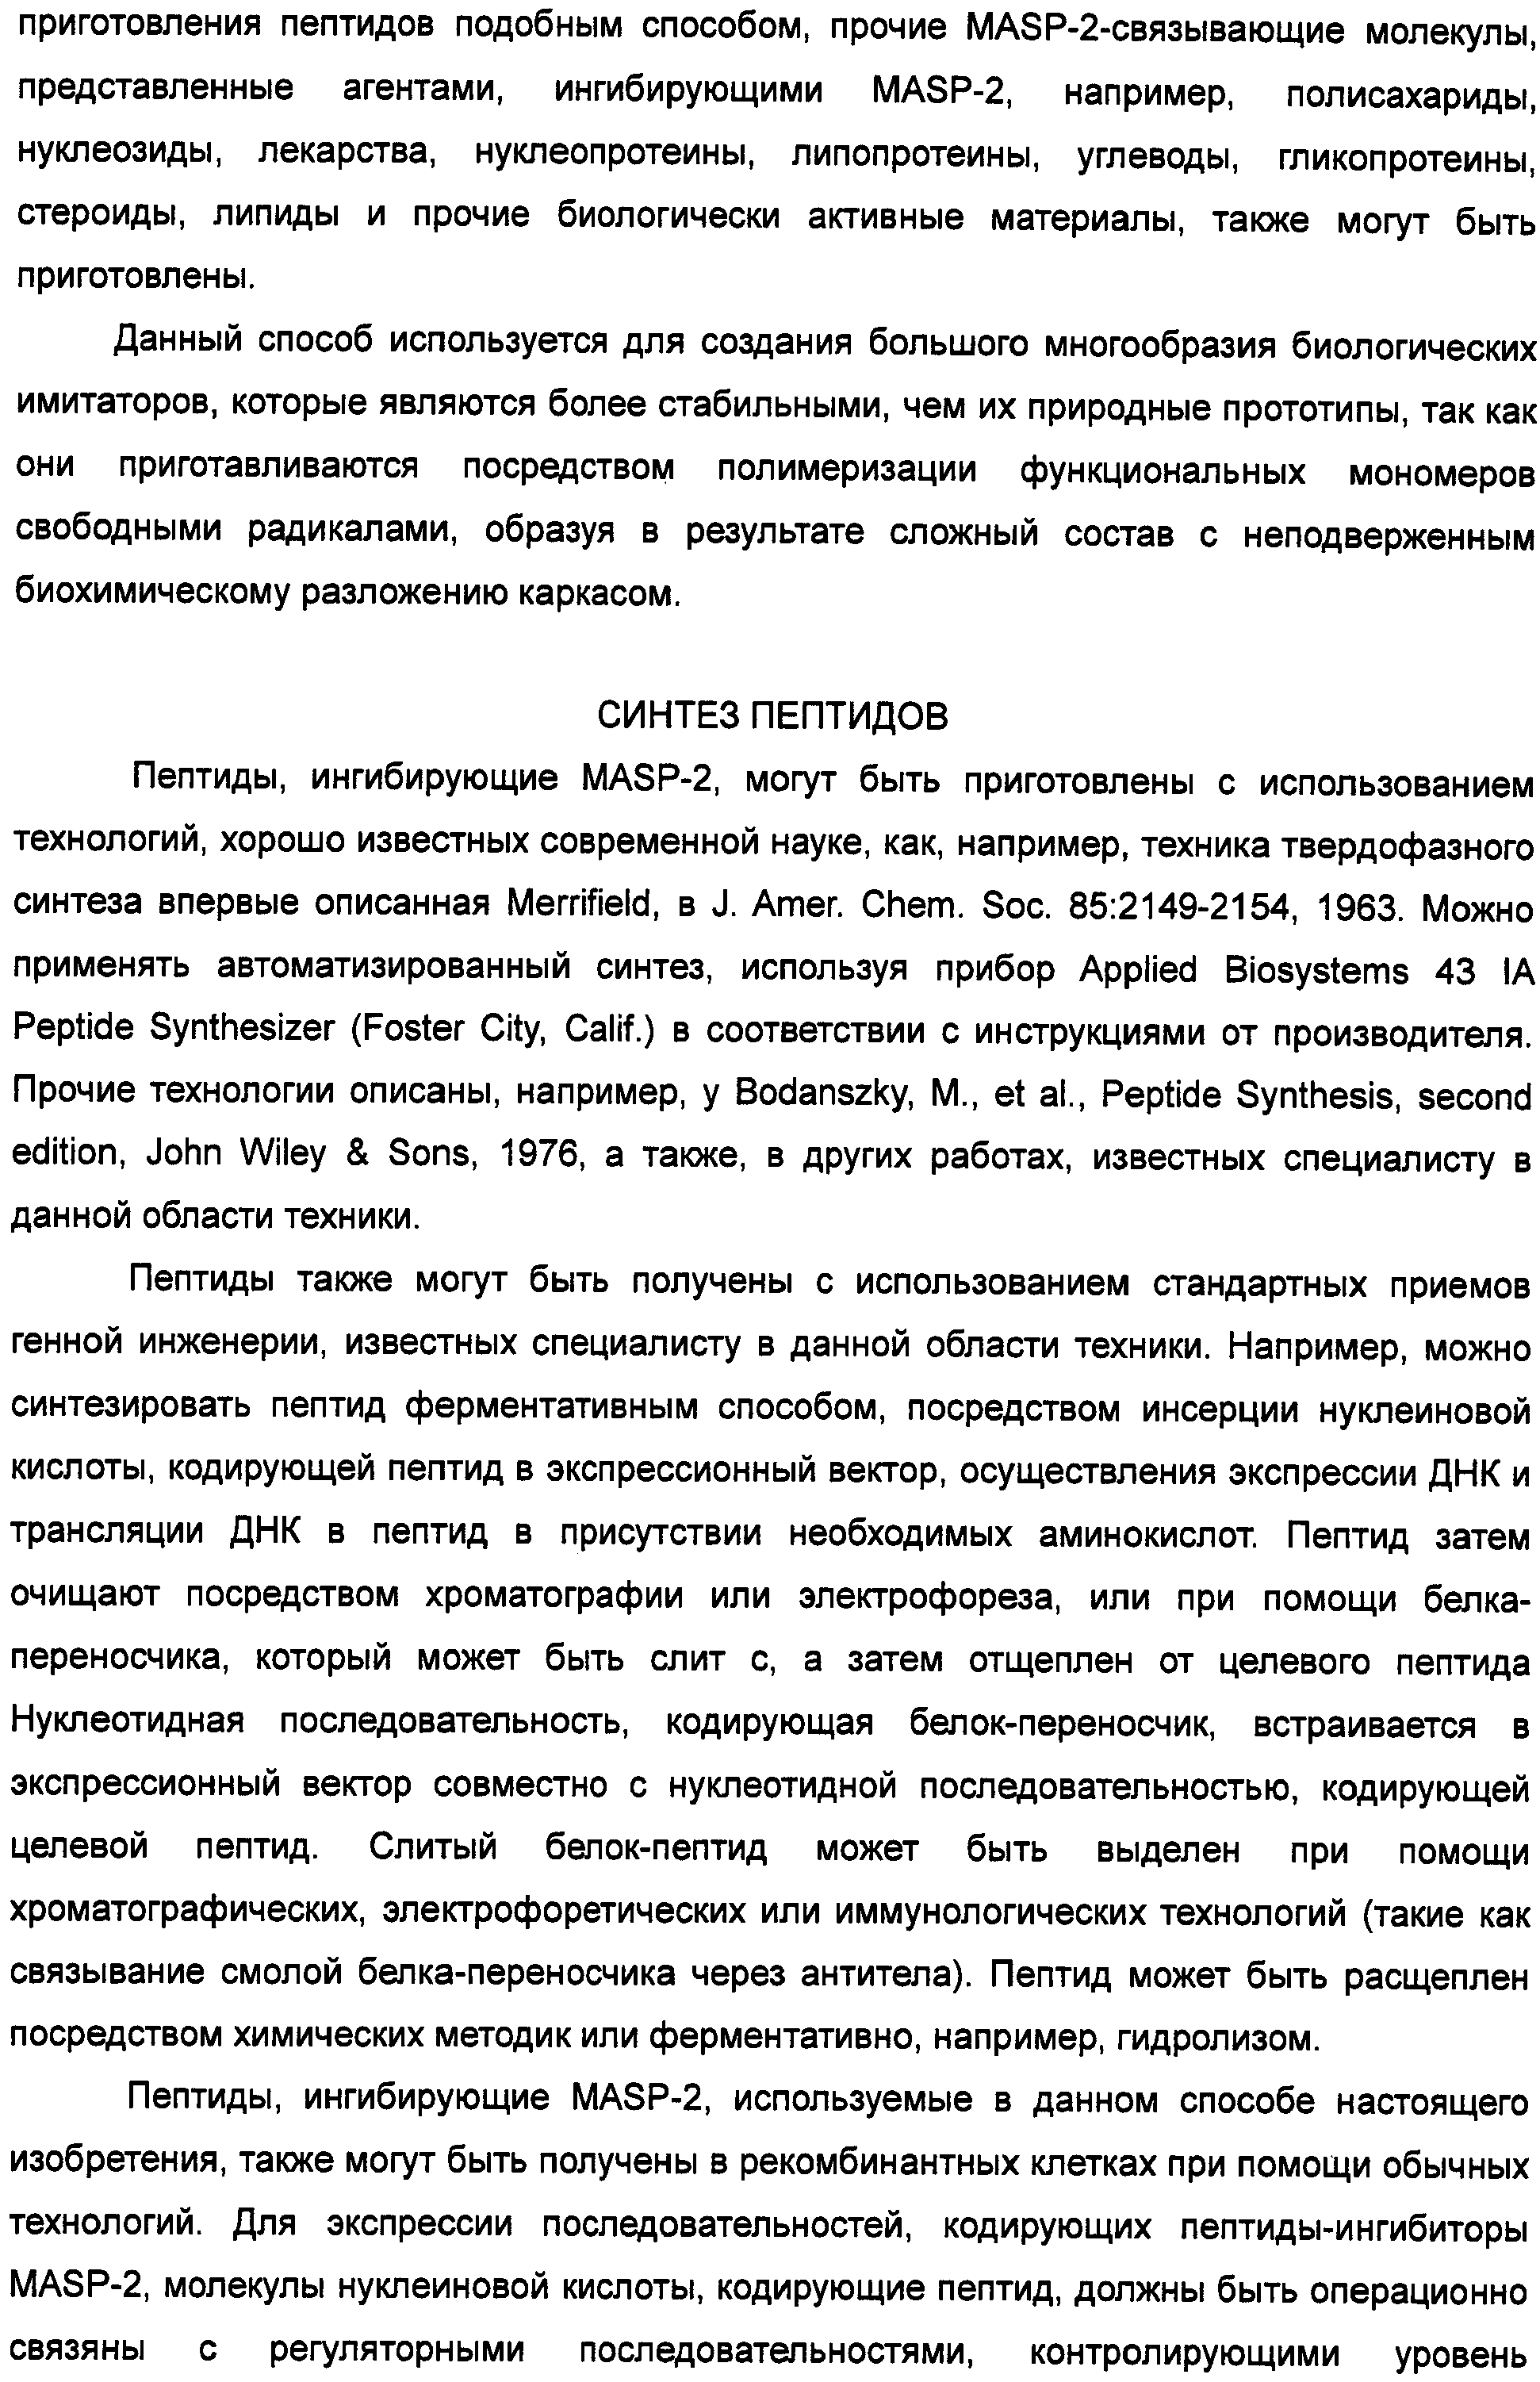 Figure 00000100